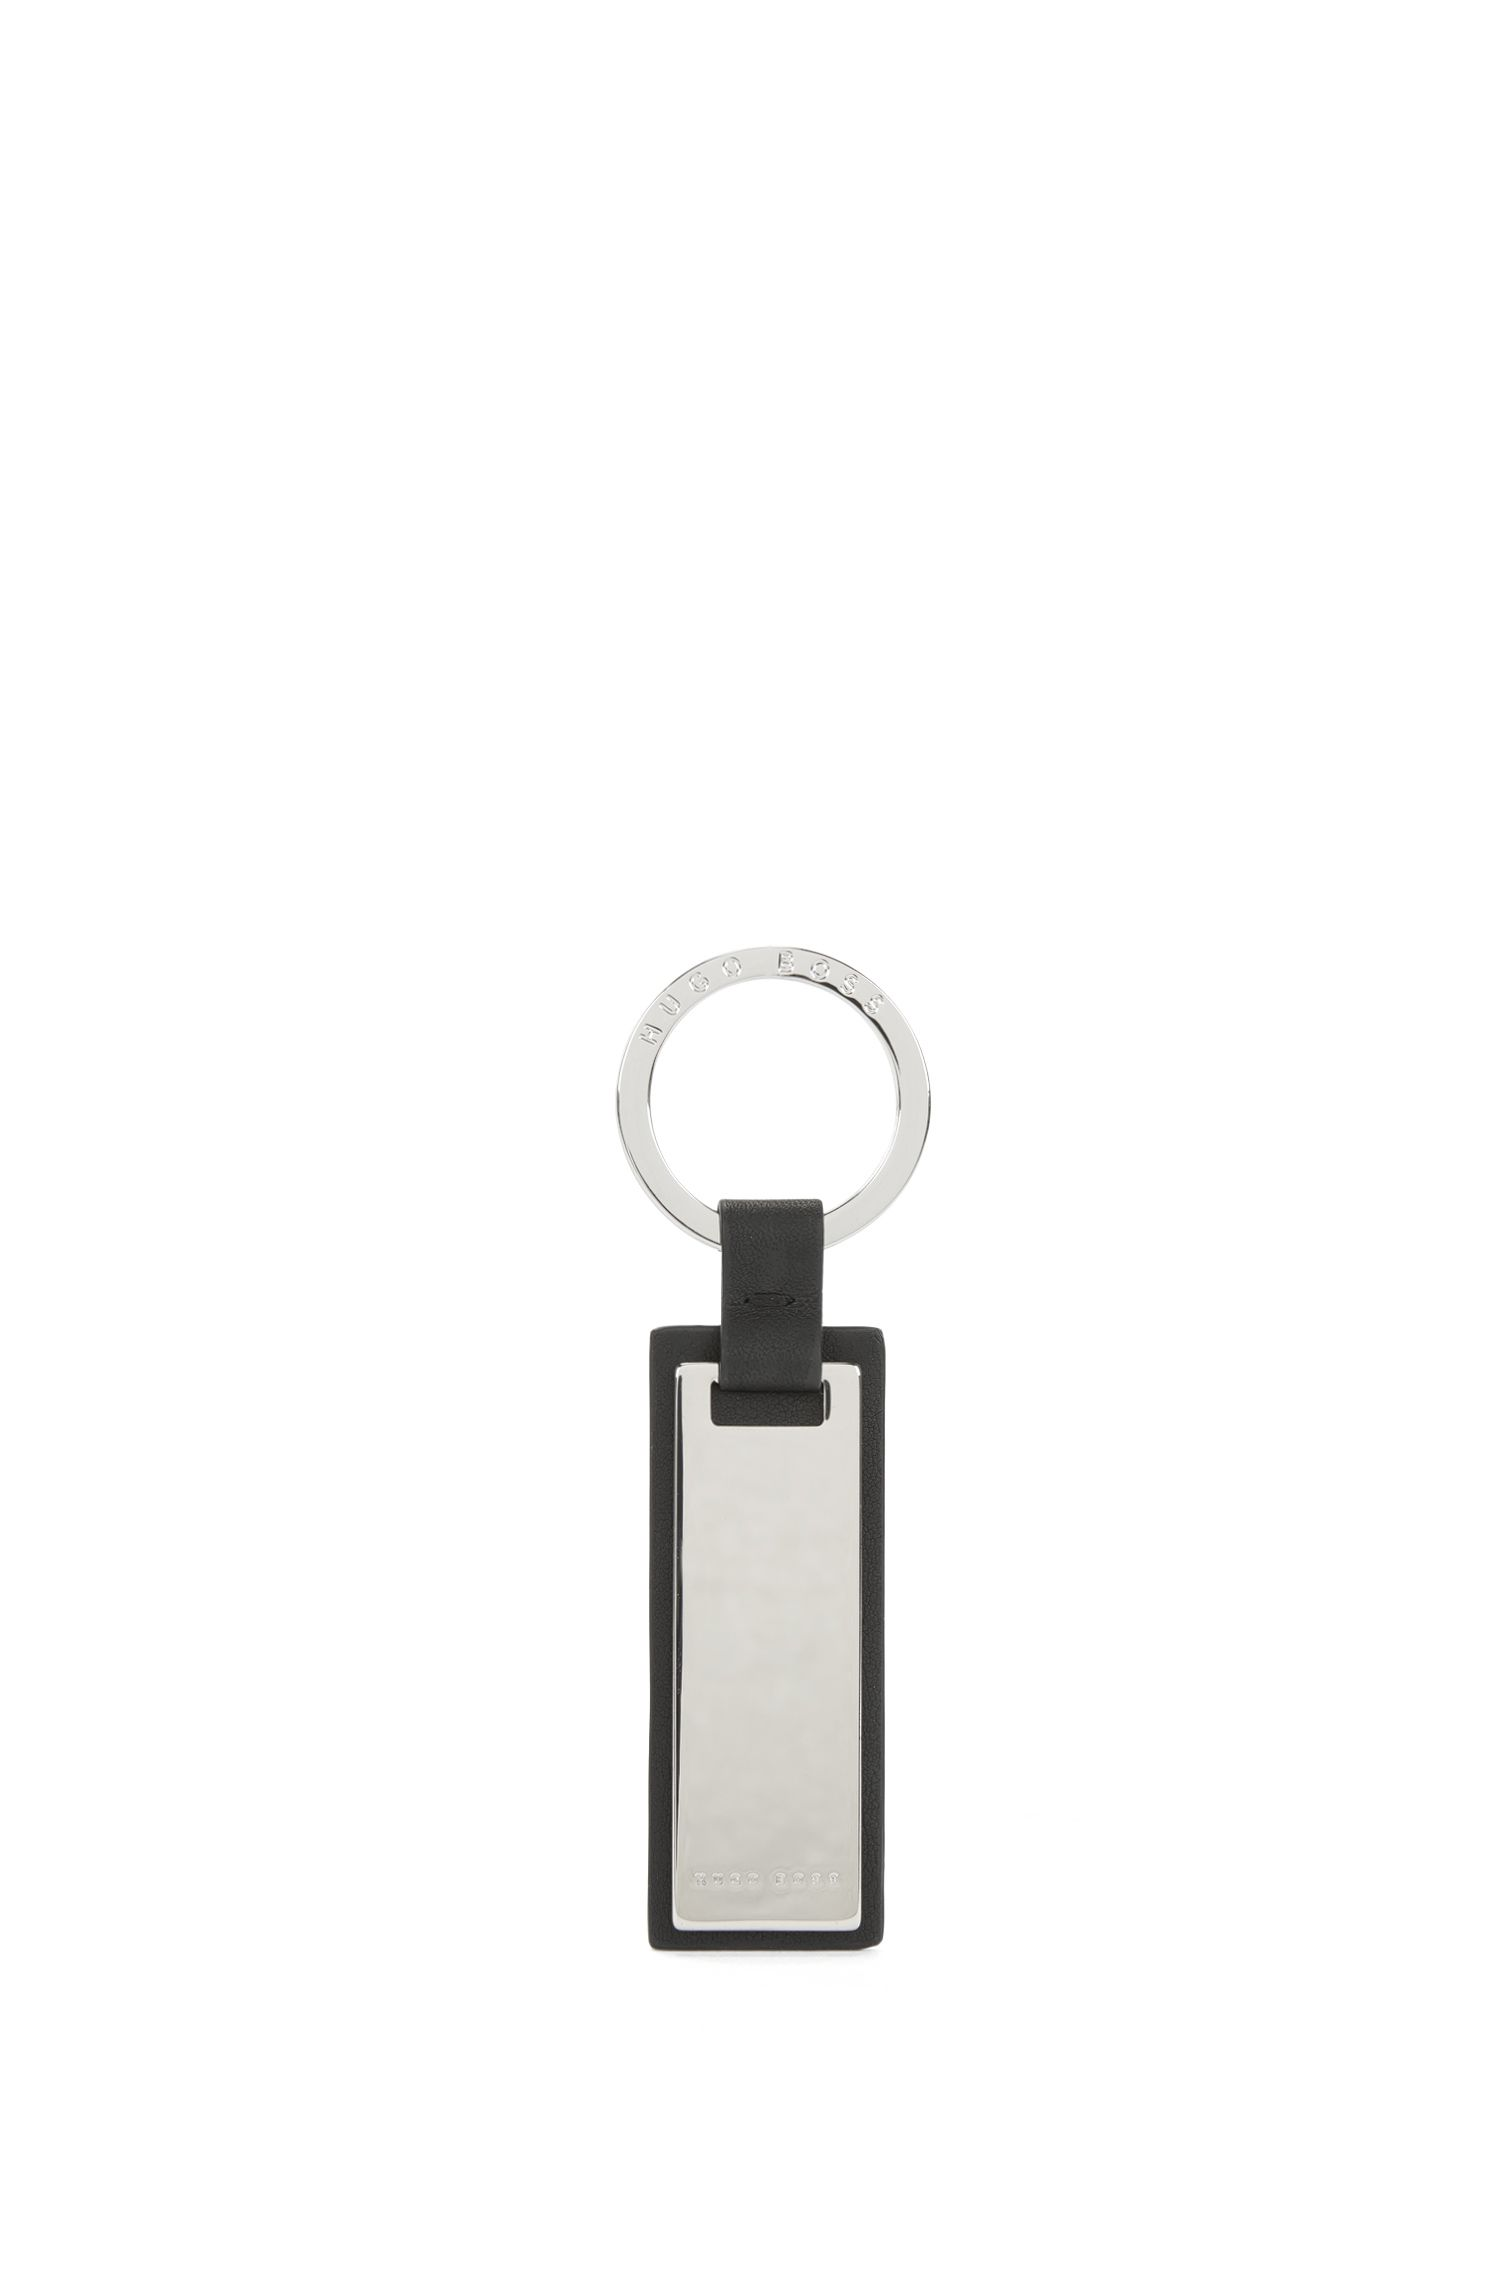 Leather Trim Key Fob | Majestic Key r Brimat